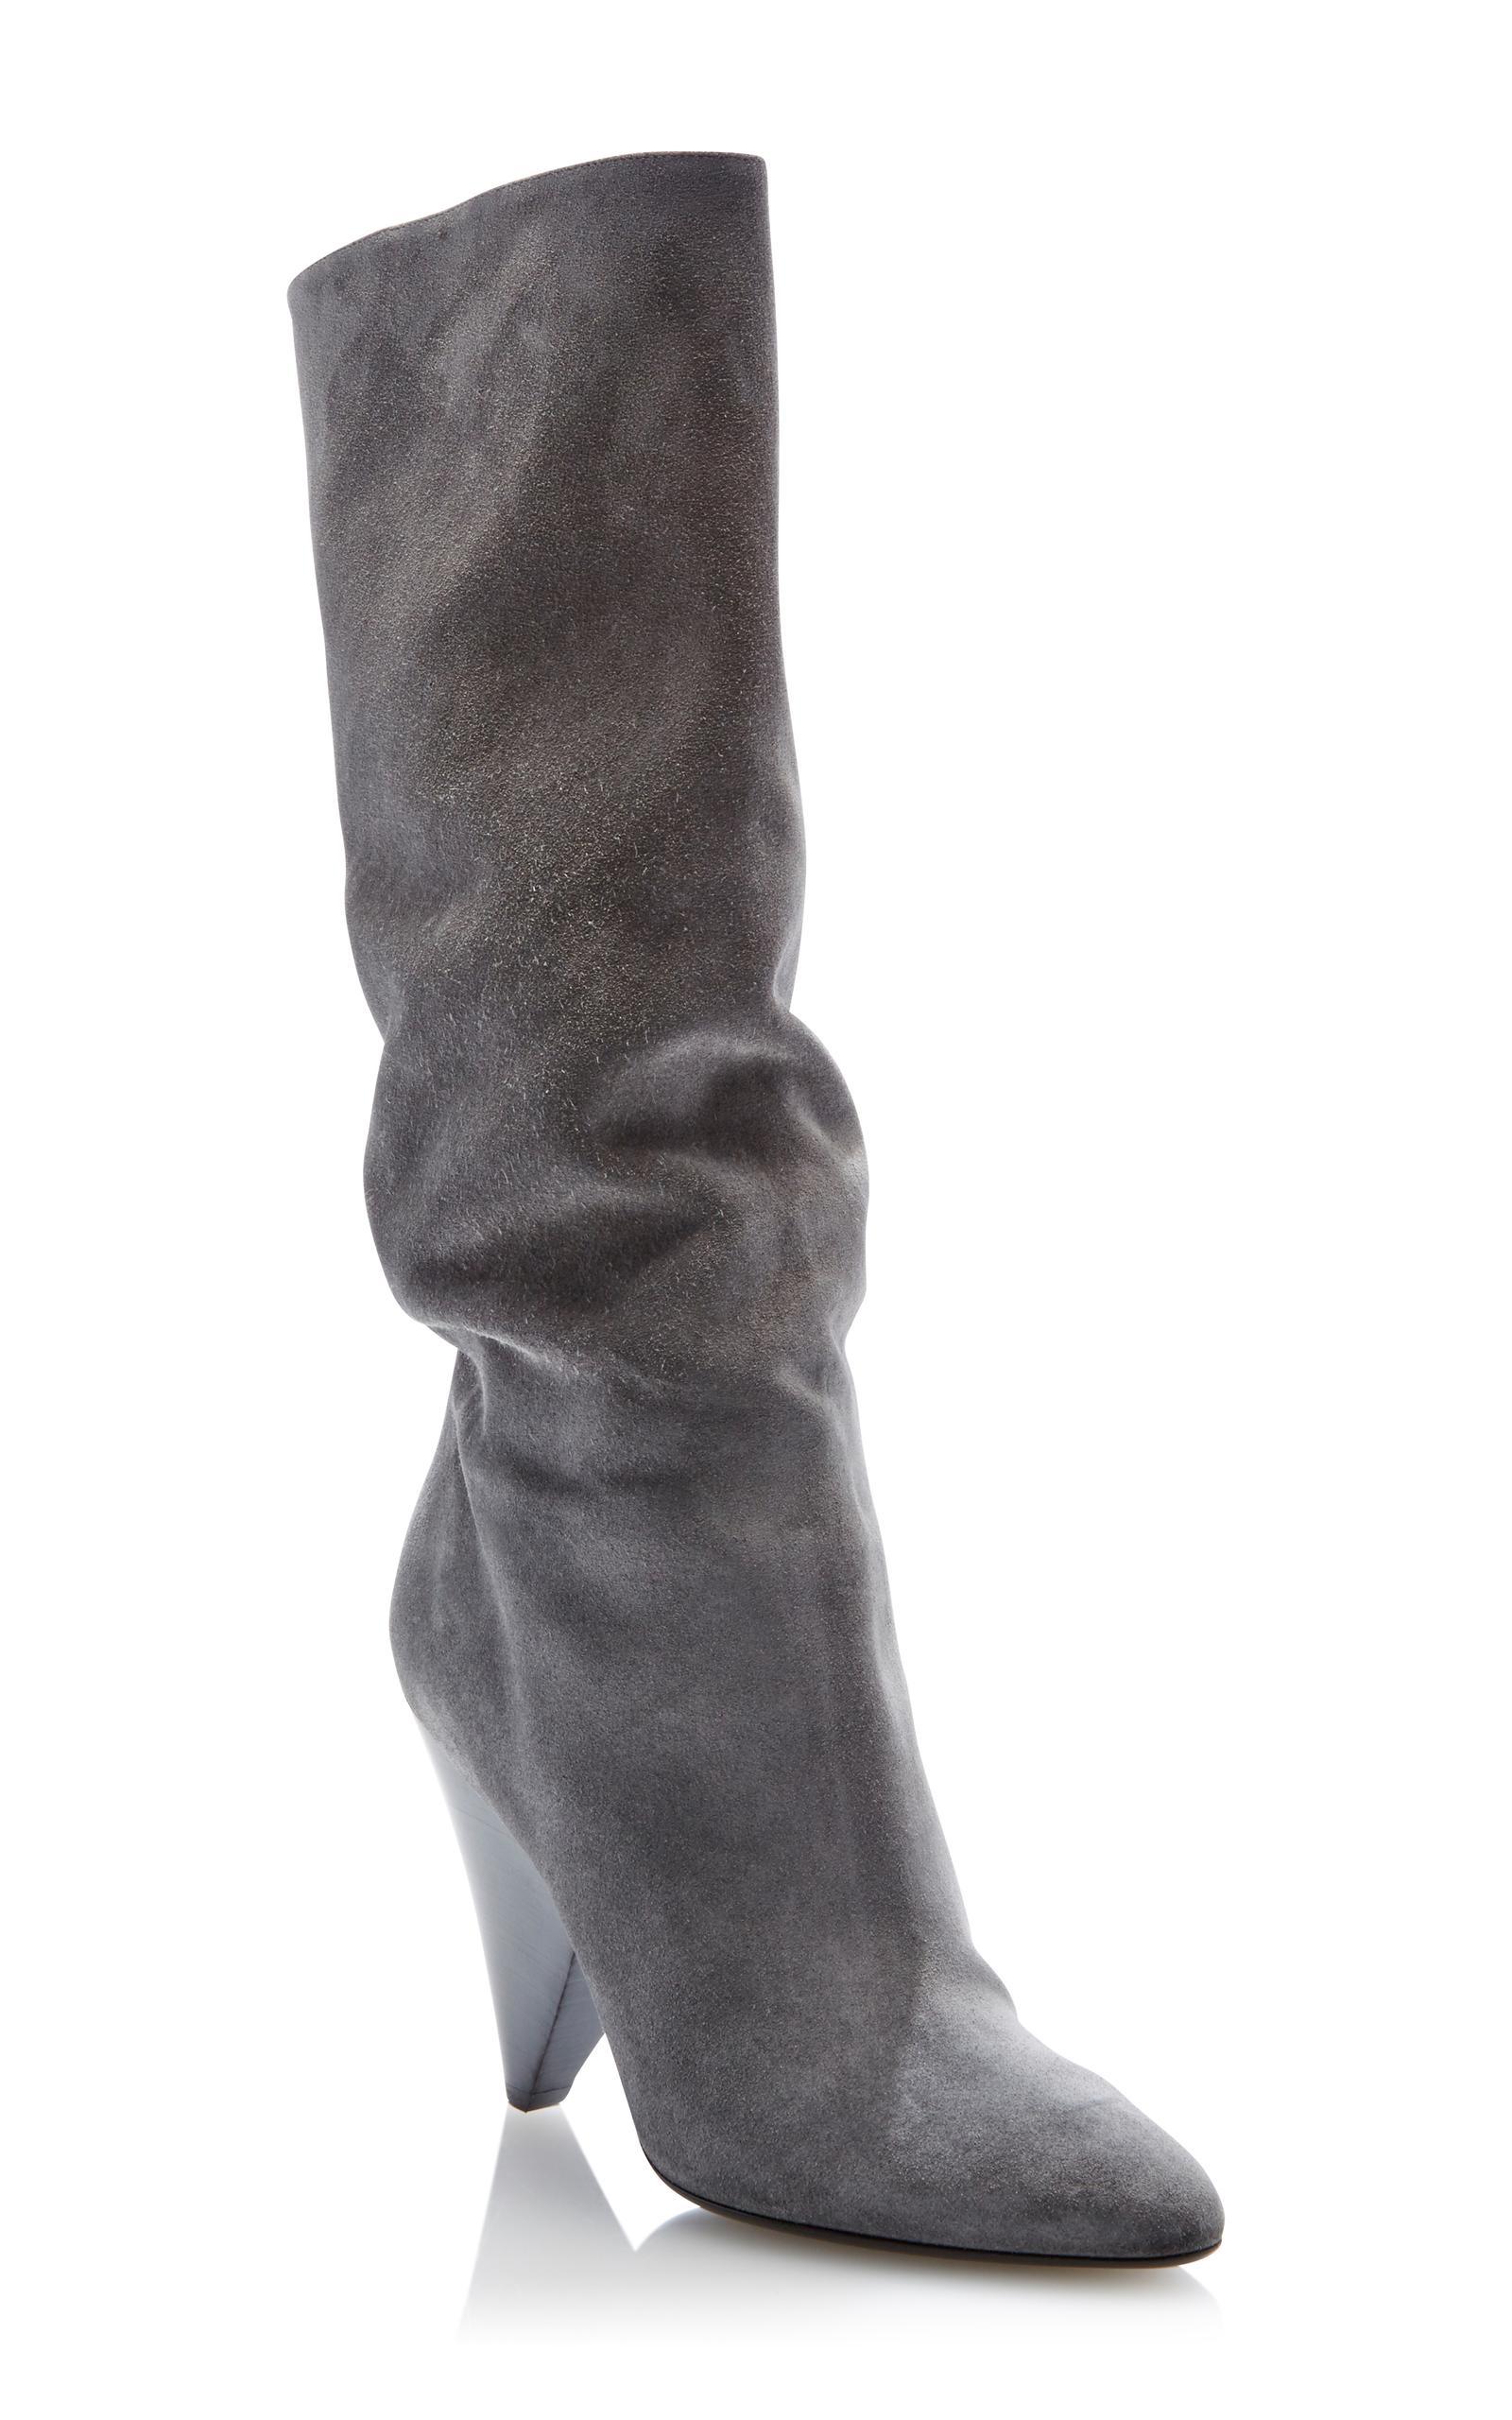 michael kors belinda suede boot in gray lyst